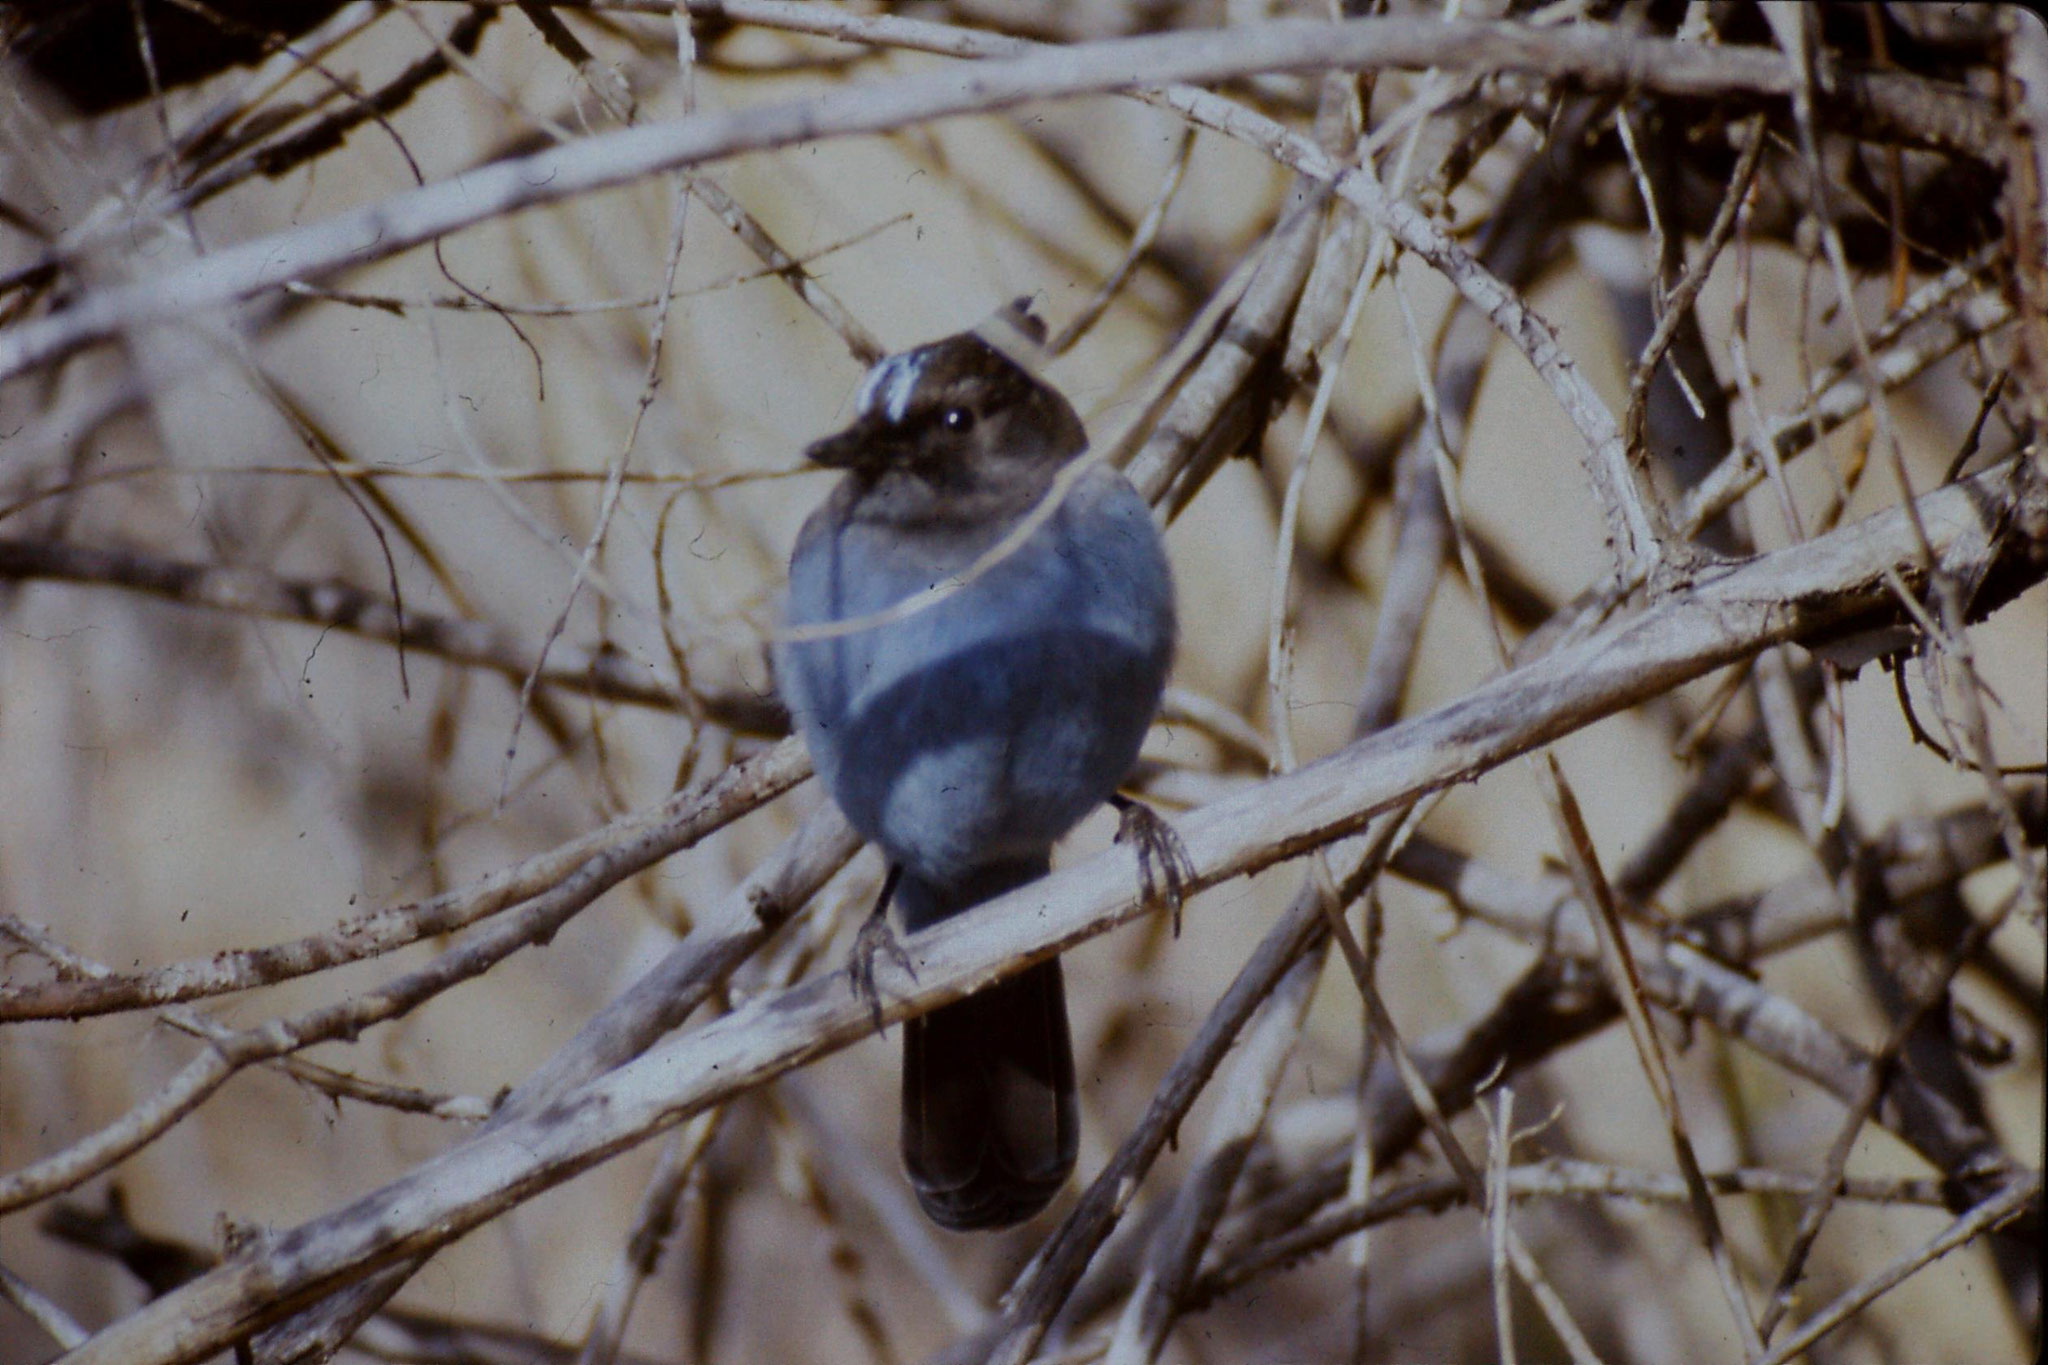 16/2/1991: 18: Yosemite Nat Park, Steller's Jay